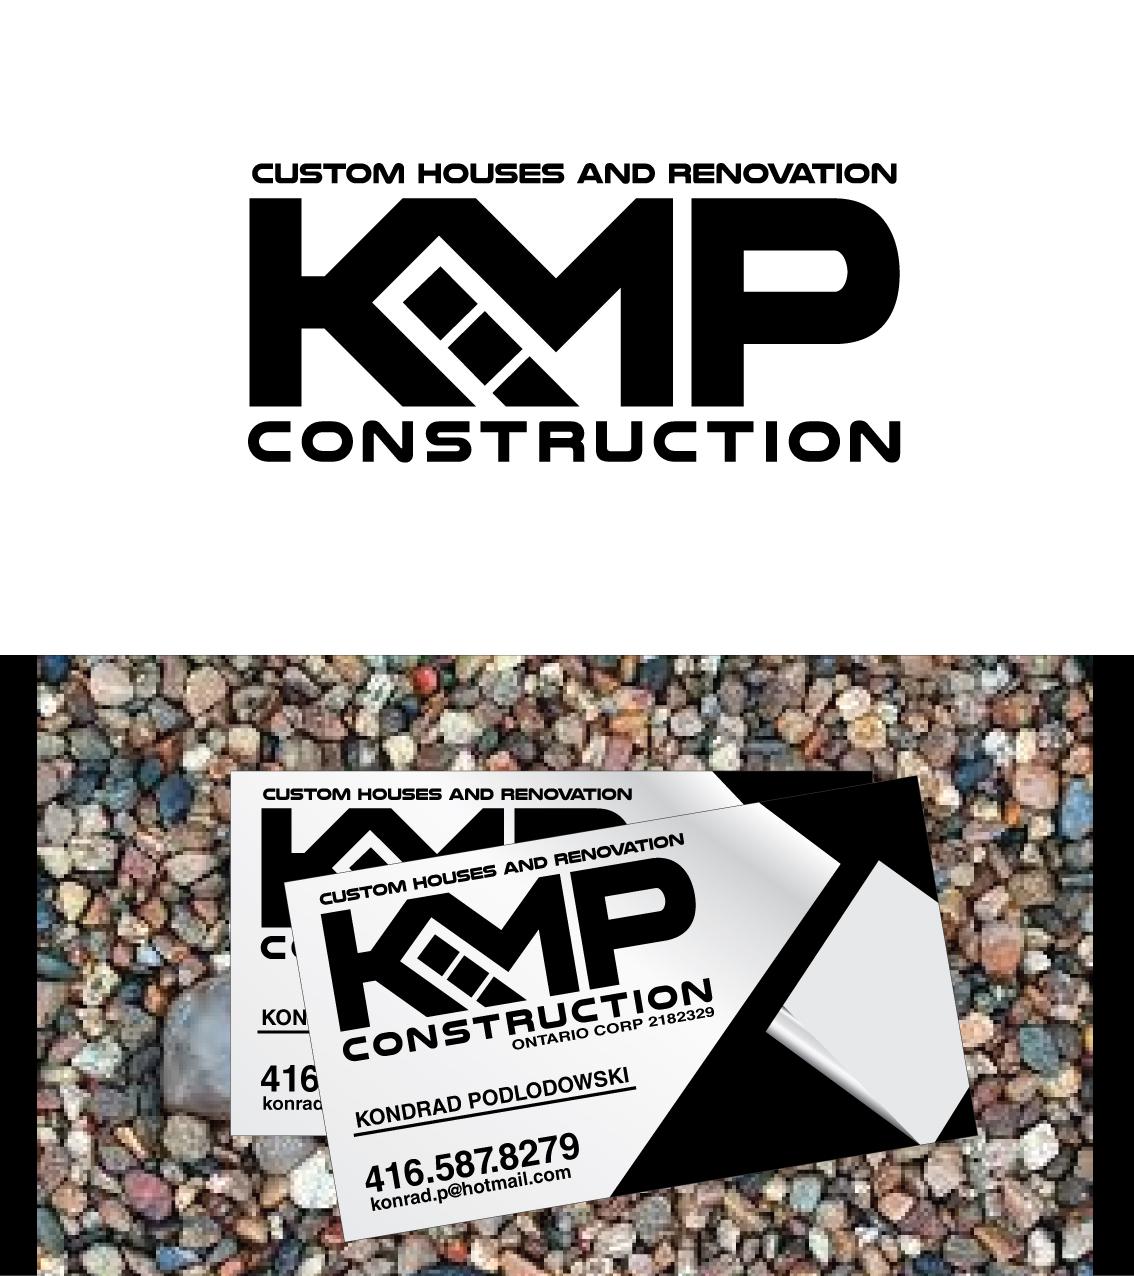 Modern Professional Construction Company Logo Design For Kmp